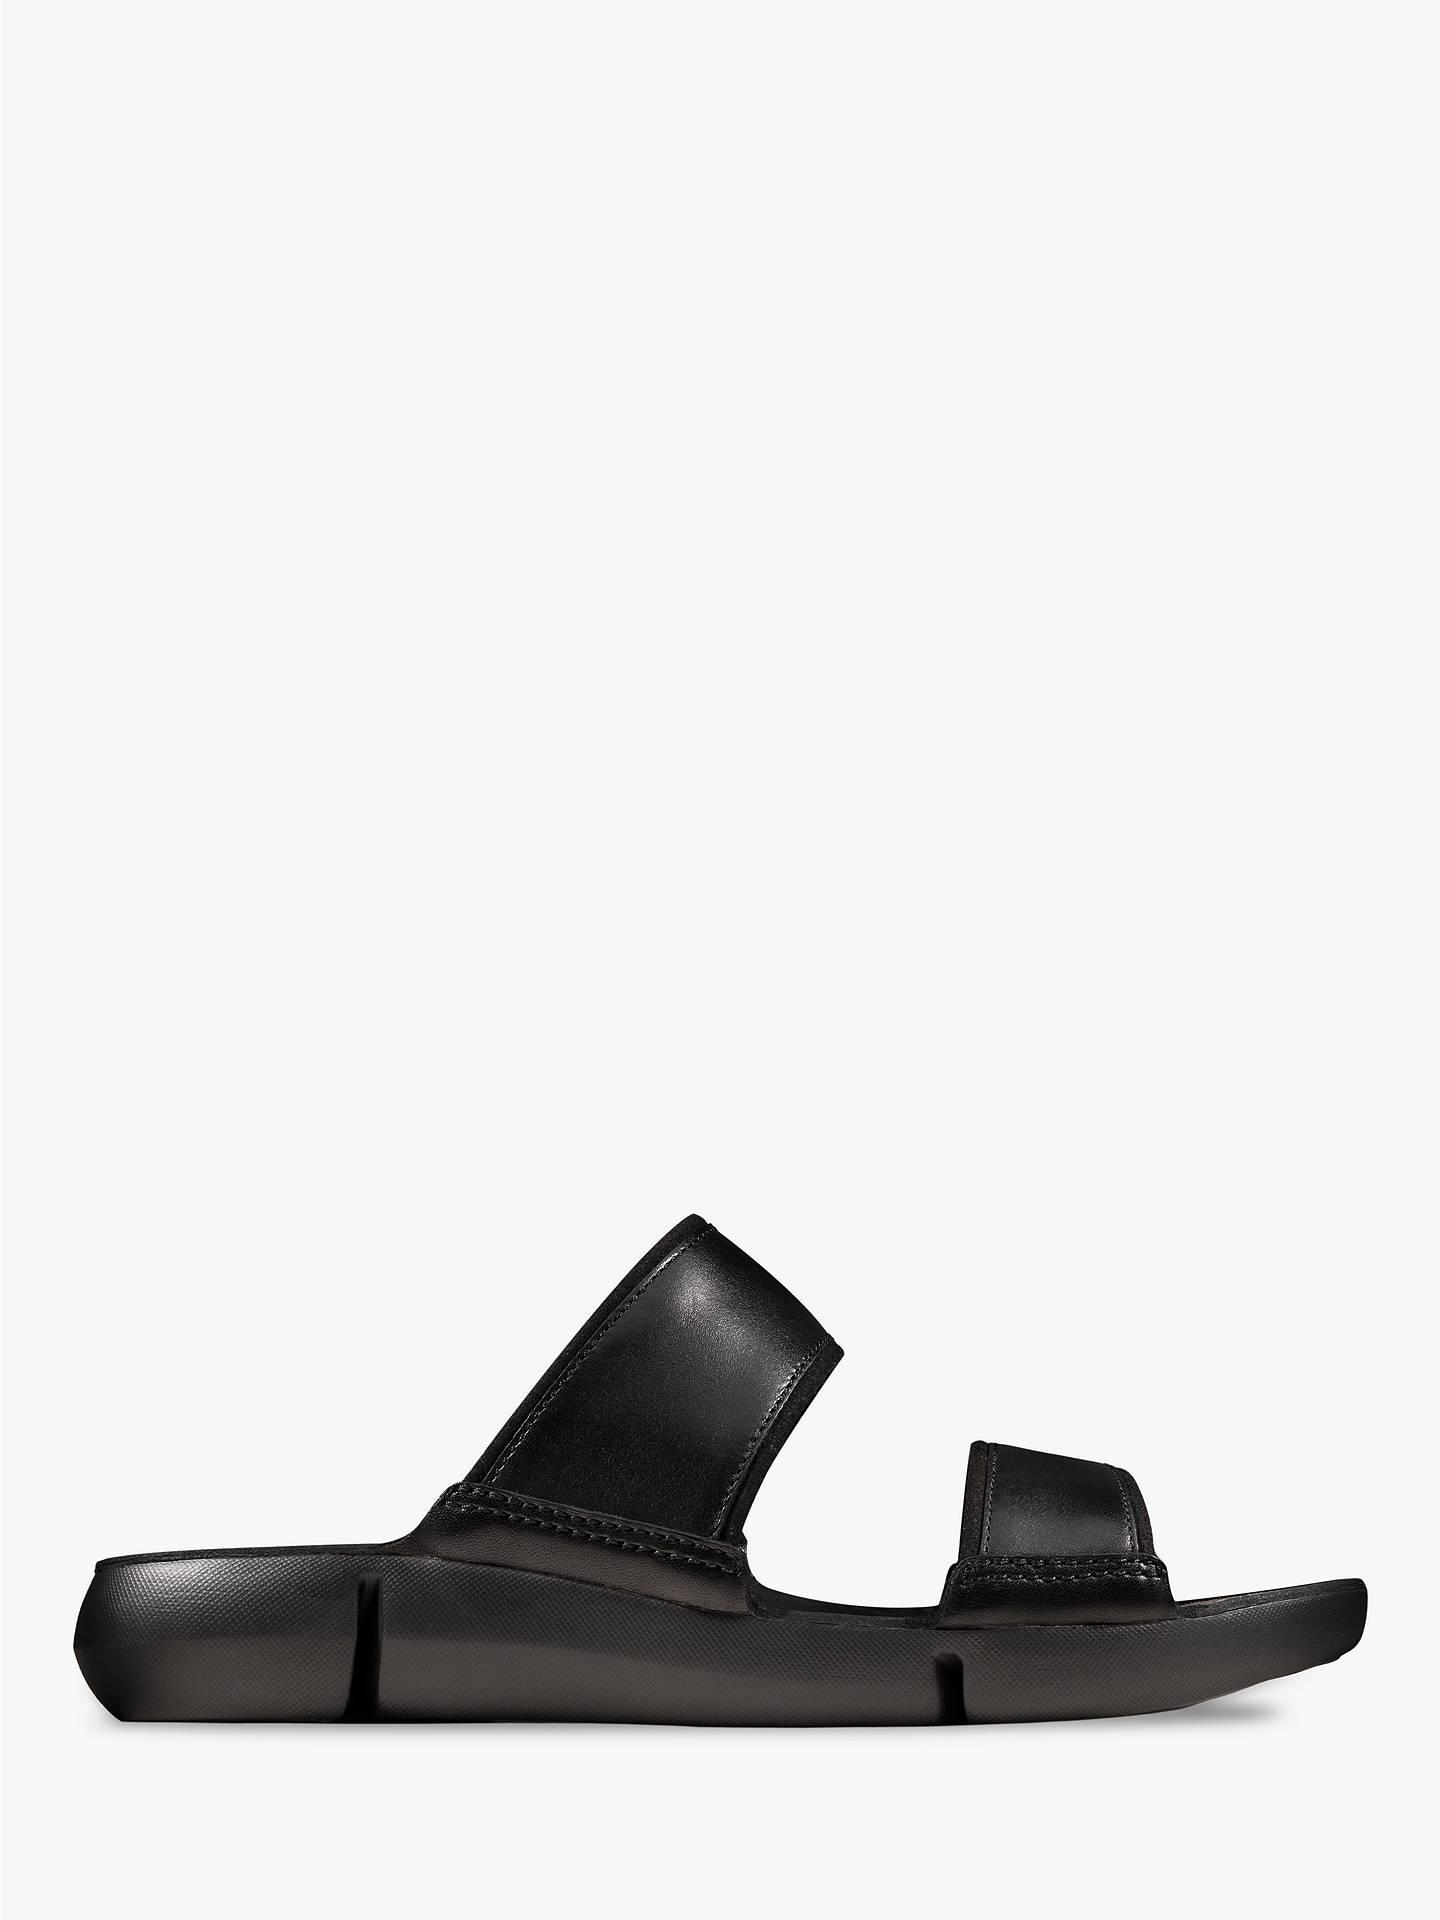 33706d1da84 Clarks Tri Sara Double Strap Slide Sandals at John Lewis   Partners